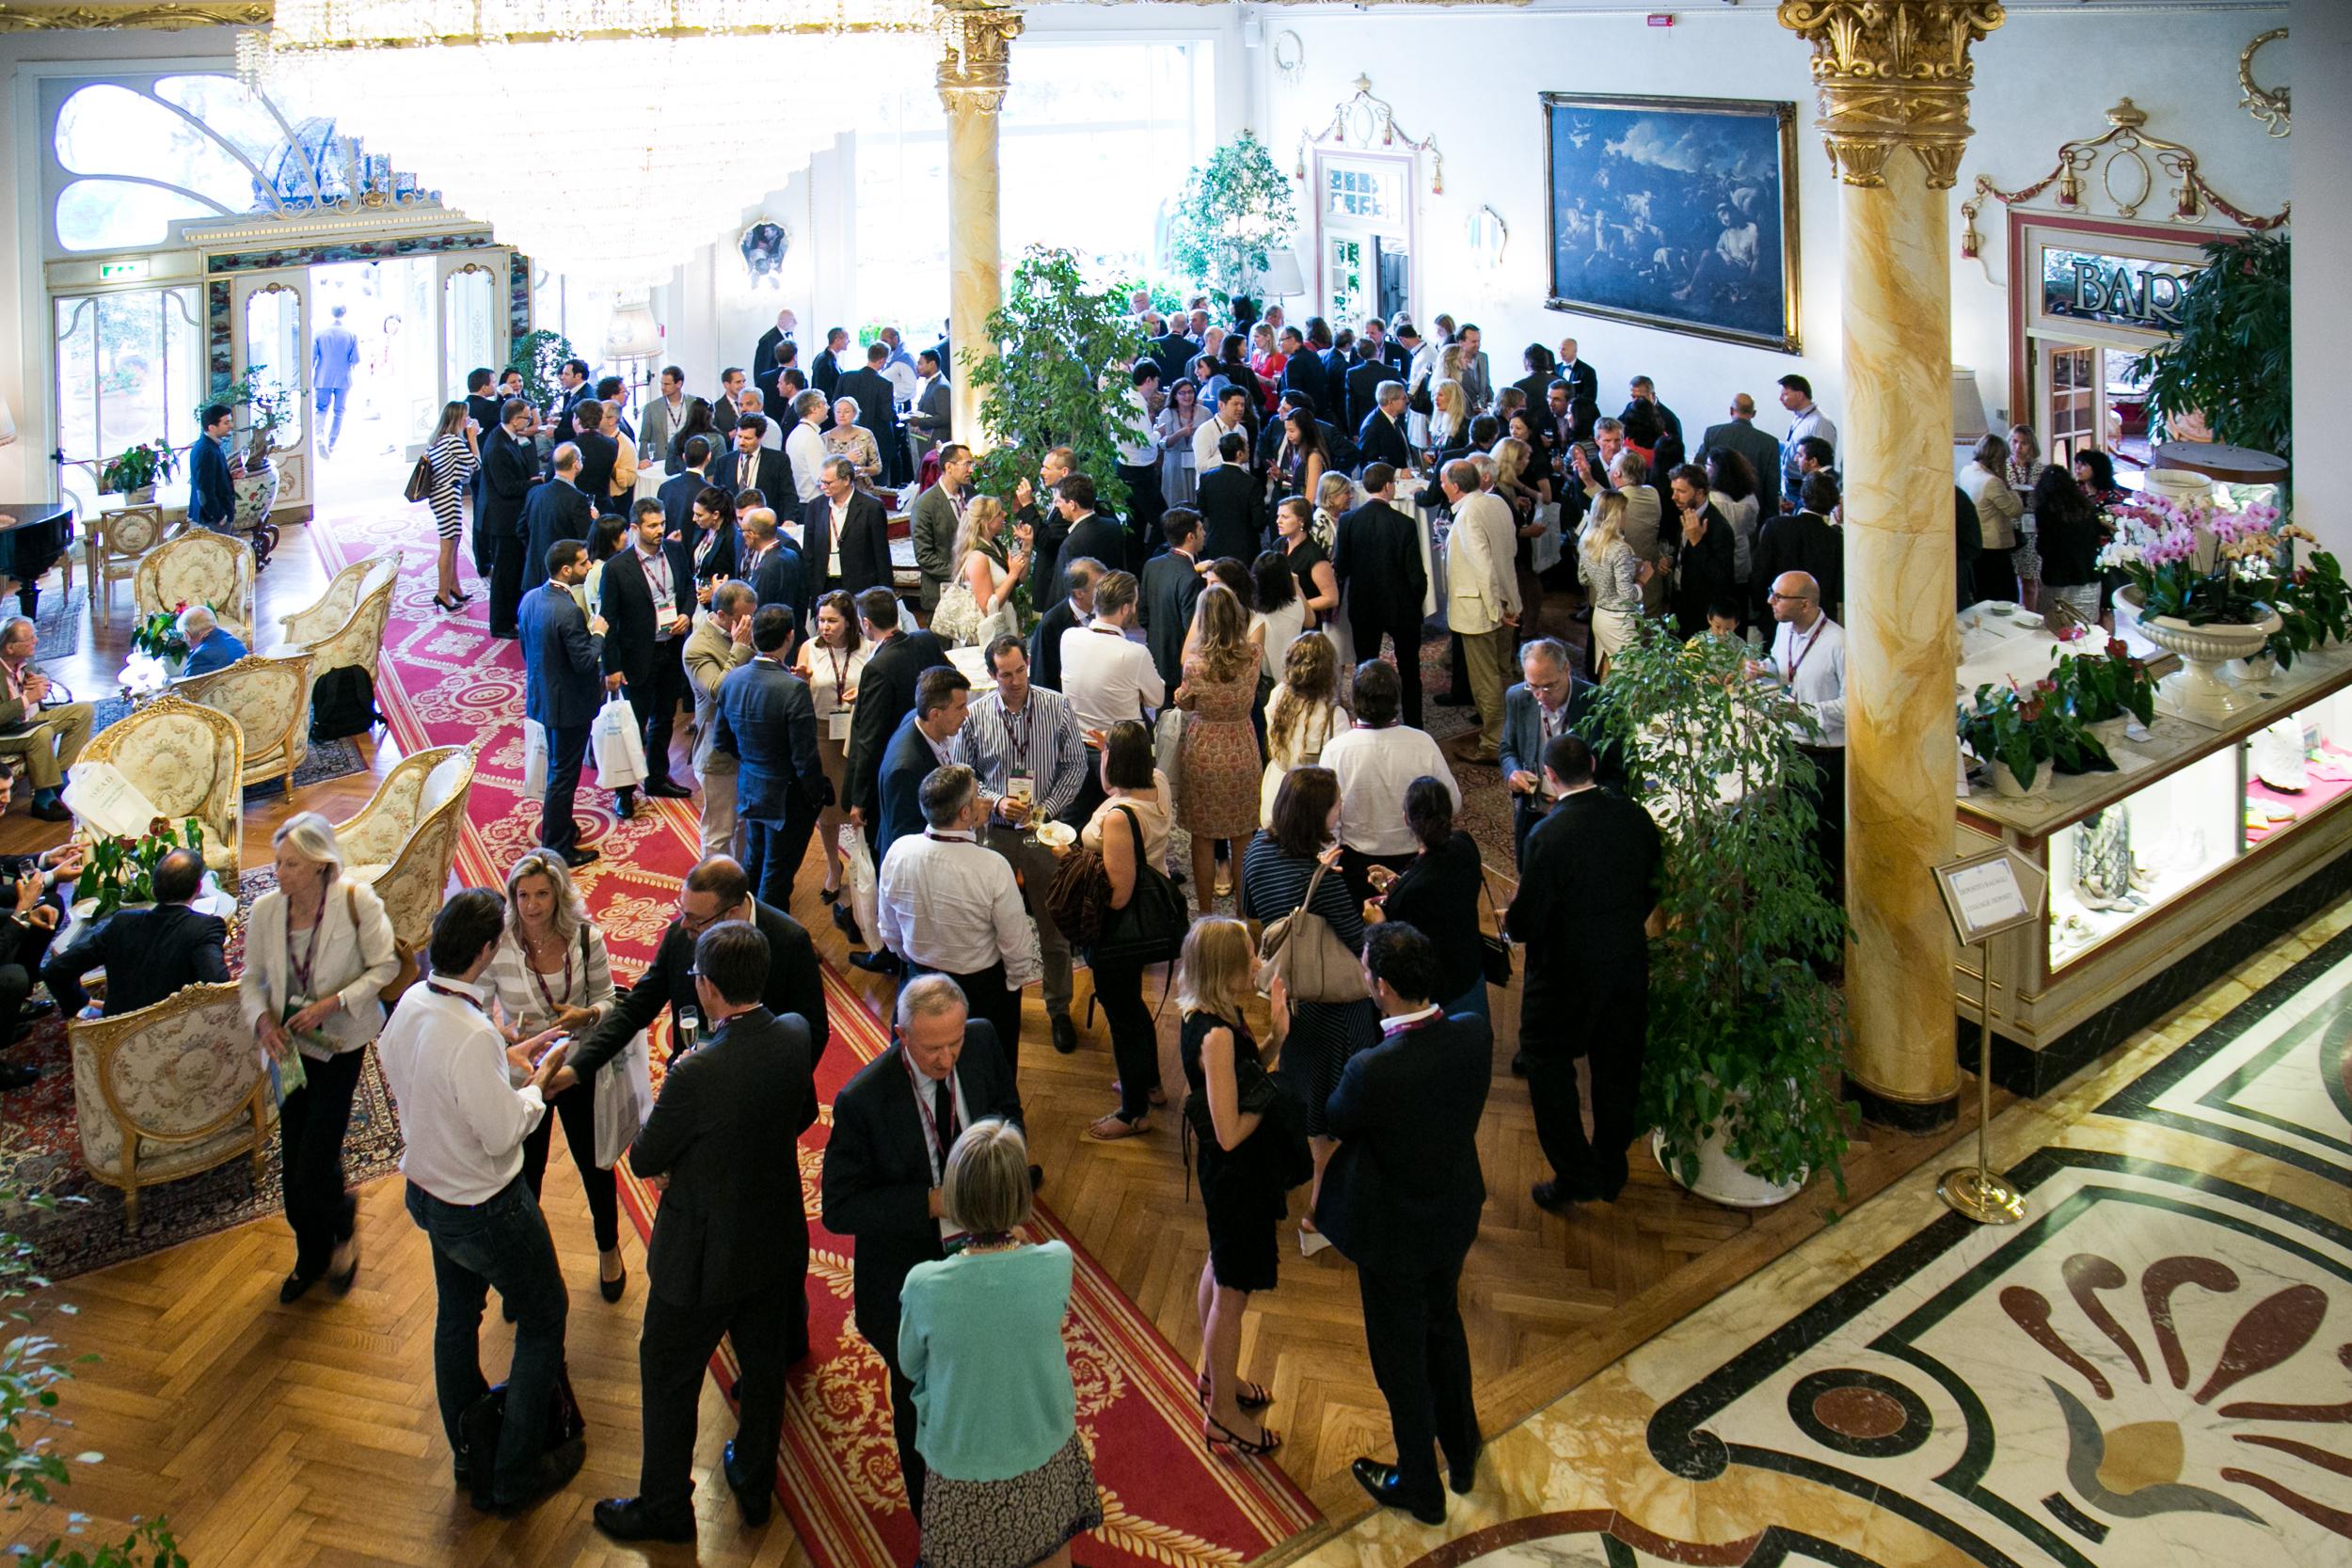 INSEAD ALAMNI GLOBAL FORUM- 400 PERSONE - HOTEL REGINA PALACE STRESA ( INSEAD ALAMNI GLOBAL FORUM- 400 PERSONE - HOTEL REGINA PALACE STRESA (VB)